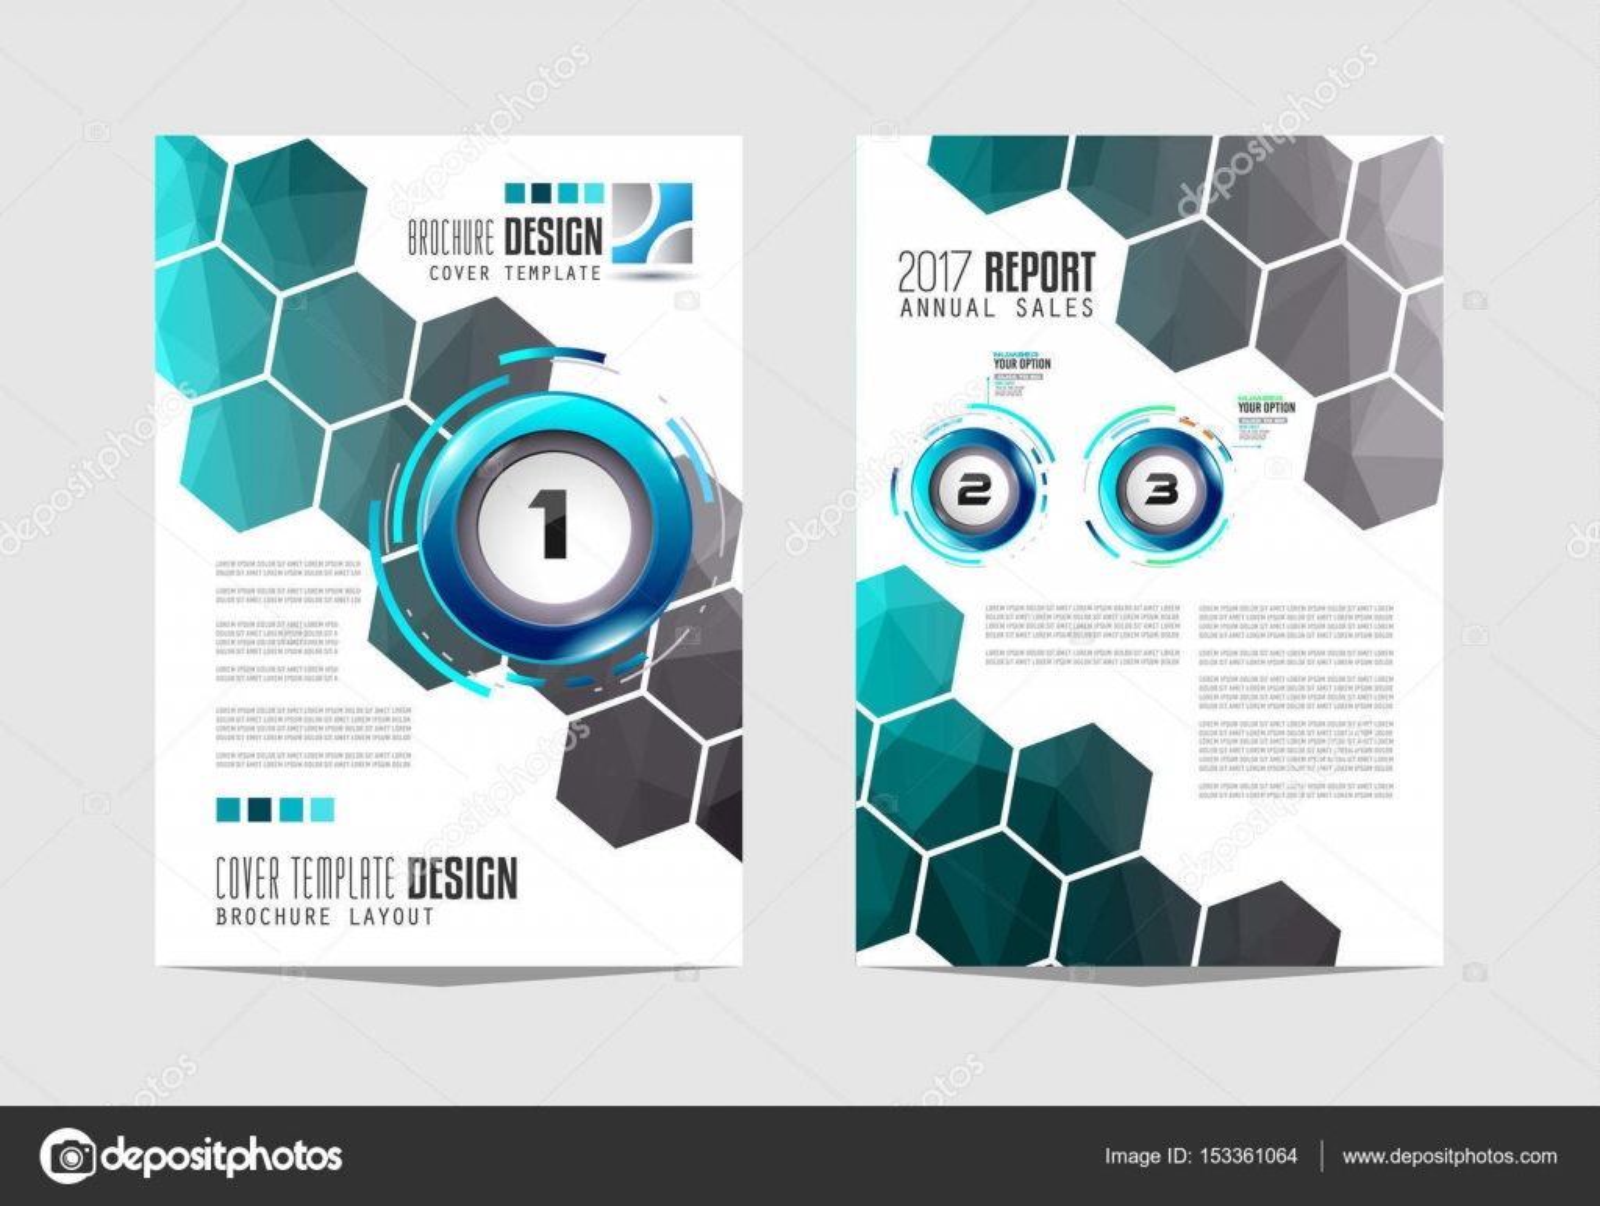 Broschüre-Vorlage, Flyer Design — Stockvektor © DavidArts #153361064